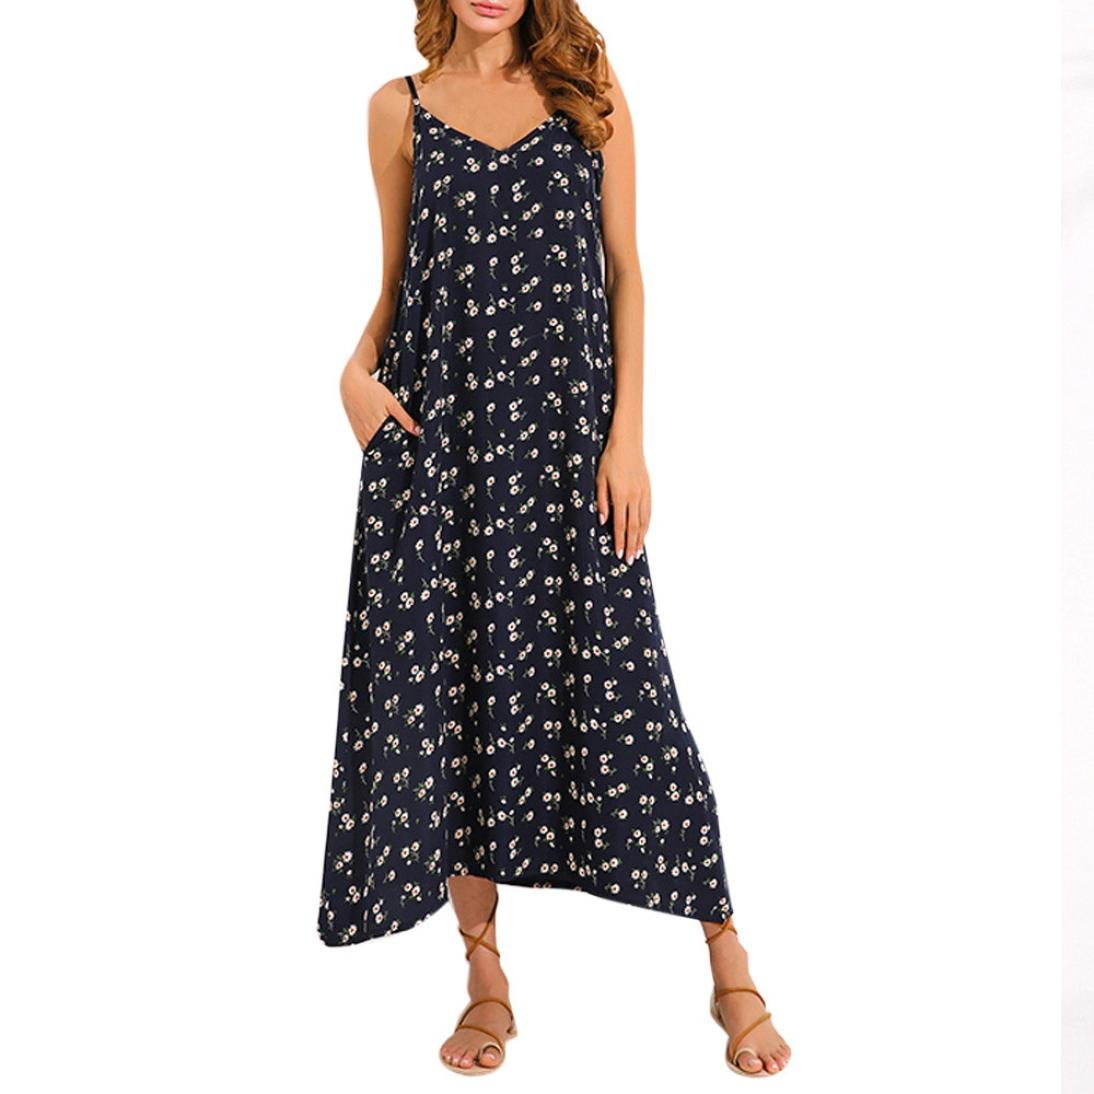 Bafaretk Womens Summer Strappy V Neck Pocket Casual Backless Boho Maxi Long Beach Dress (XL, Navy) by Bafaretk